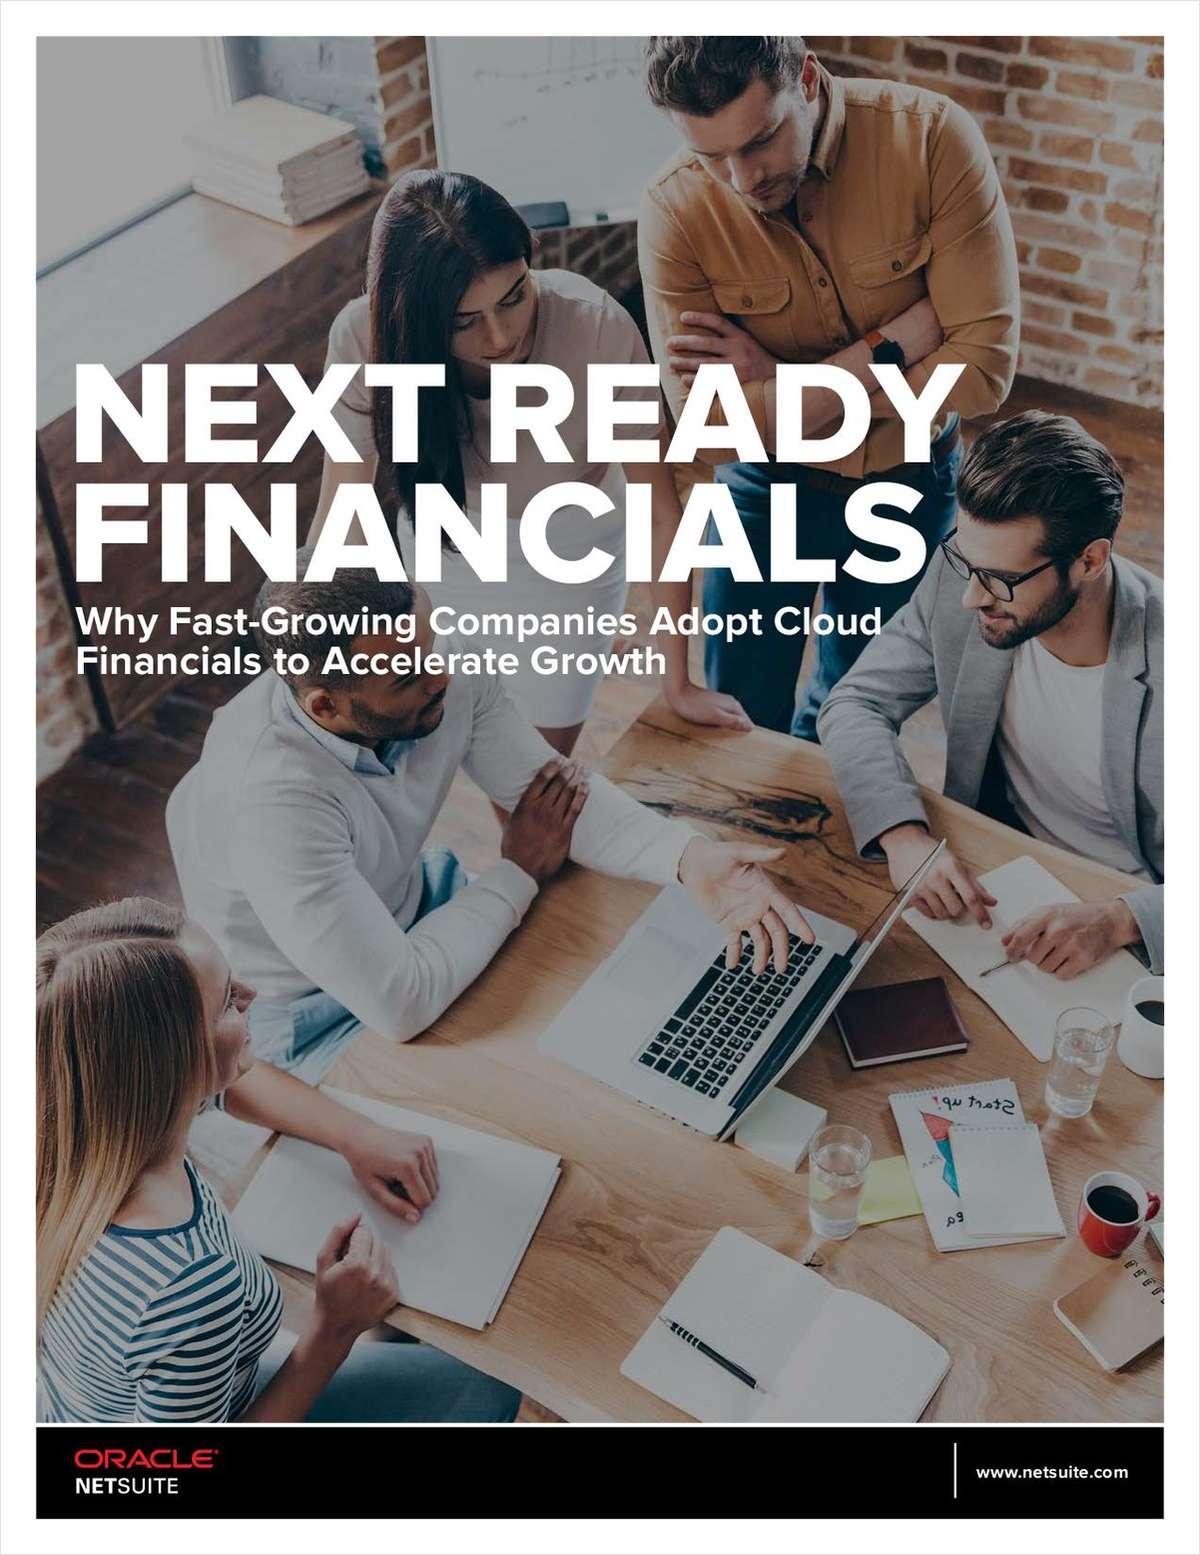 Next Ready Financials for Software & High Tech Businesses